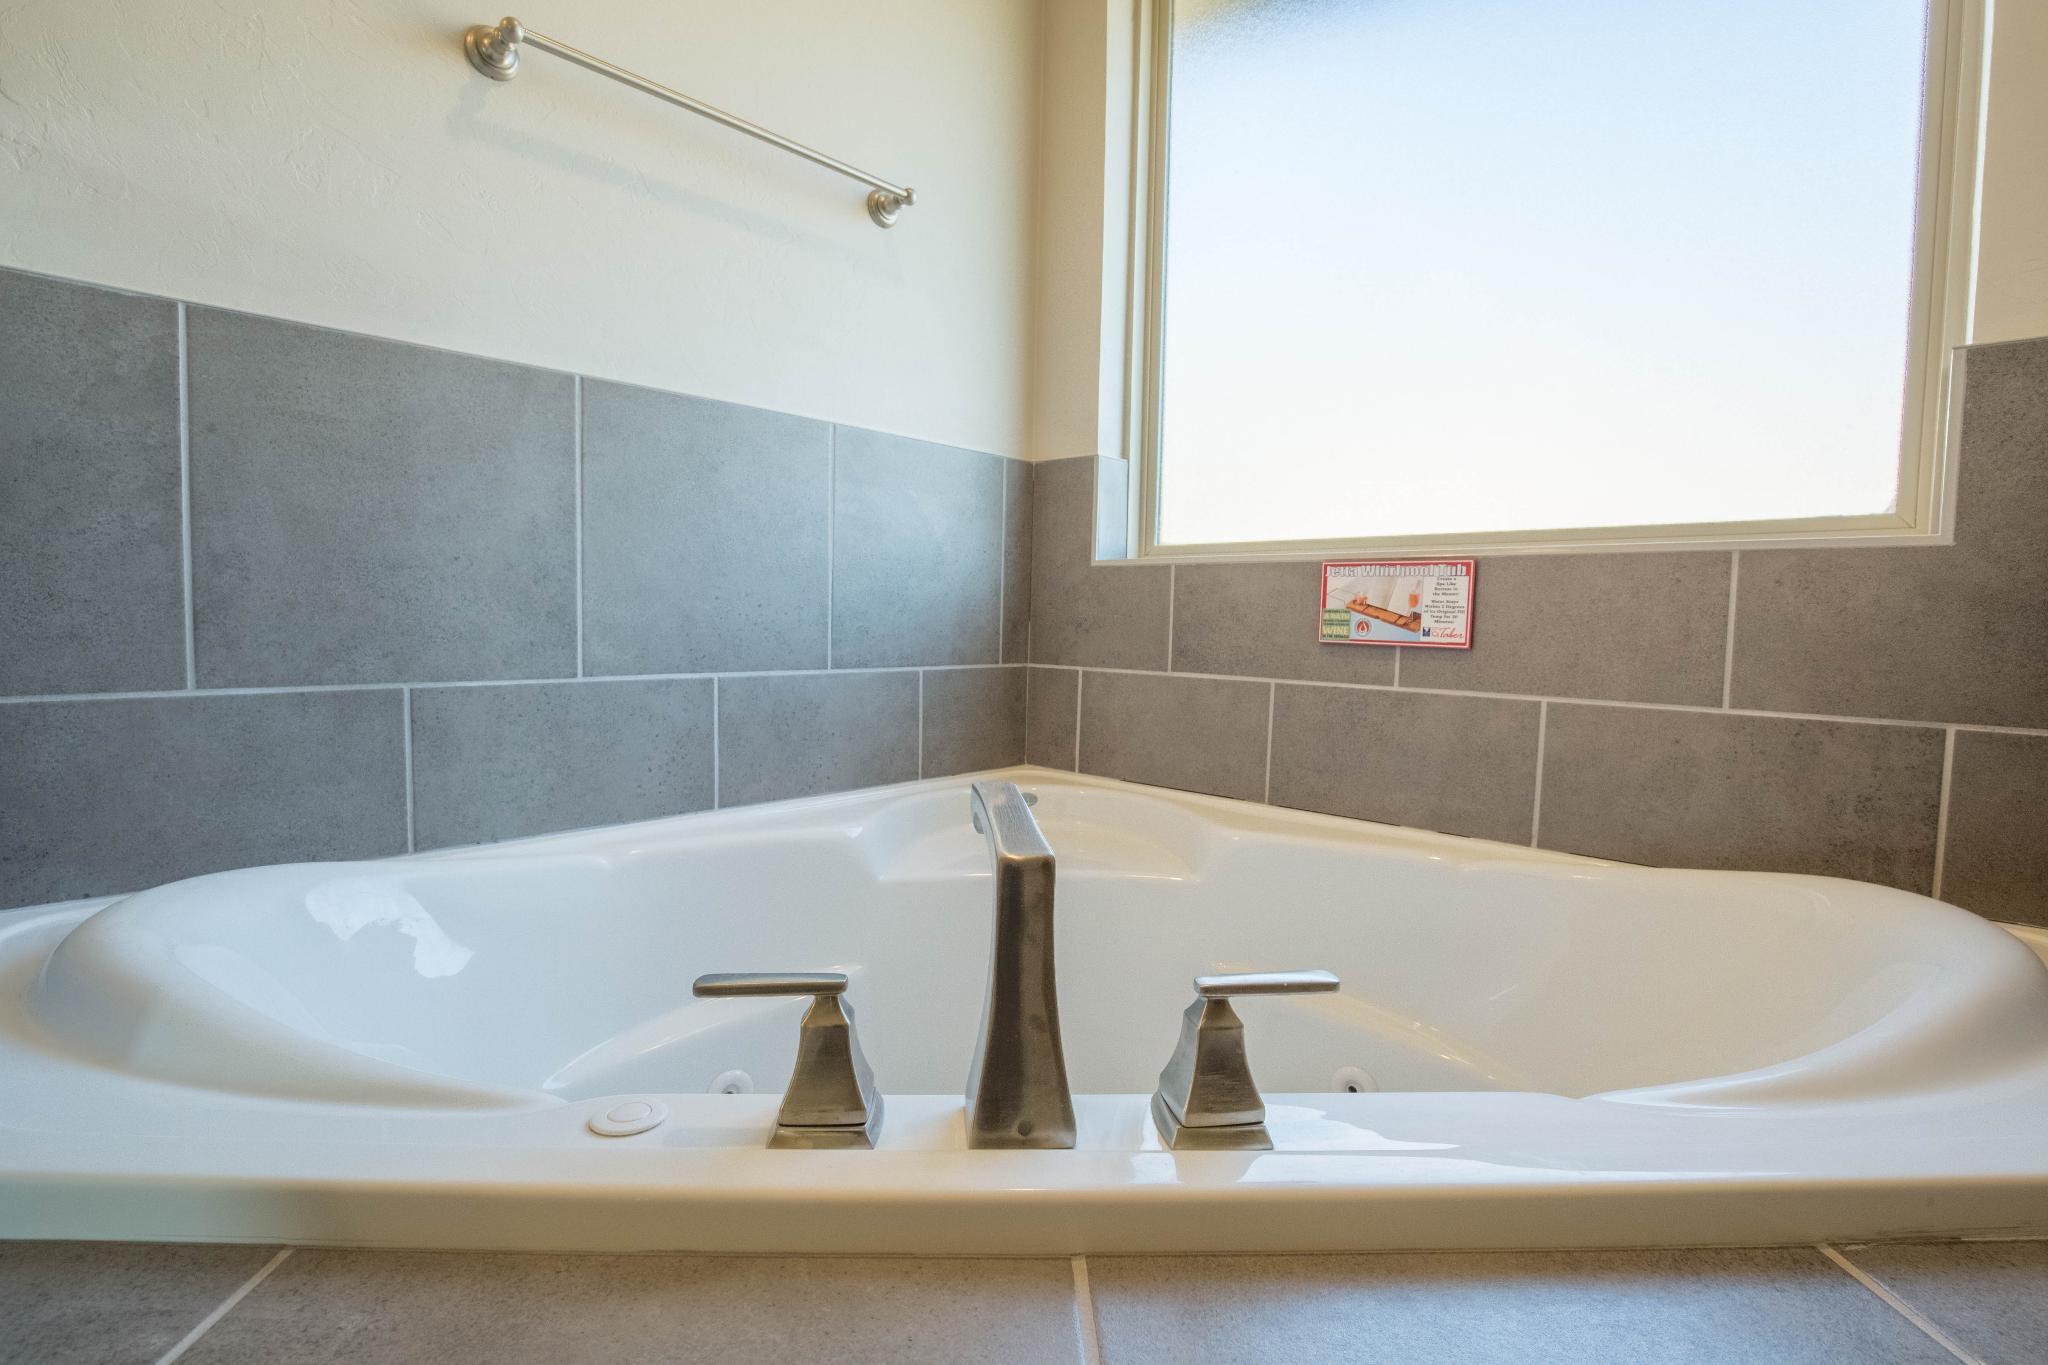 Magnificent Jetta Bathtubs Component - Bathtub Ideas - dilata.info